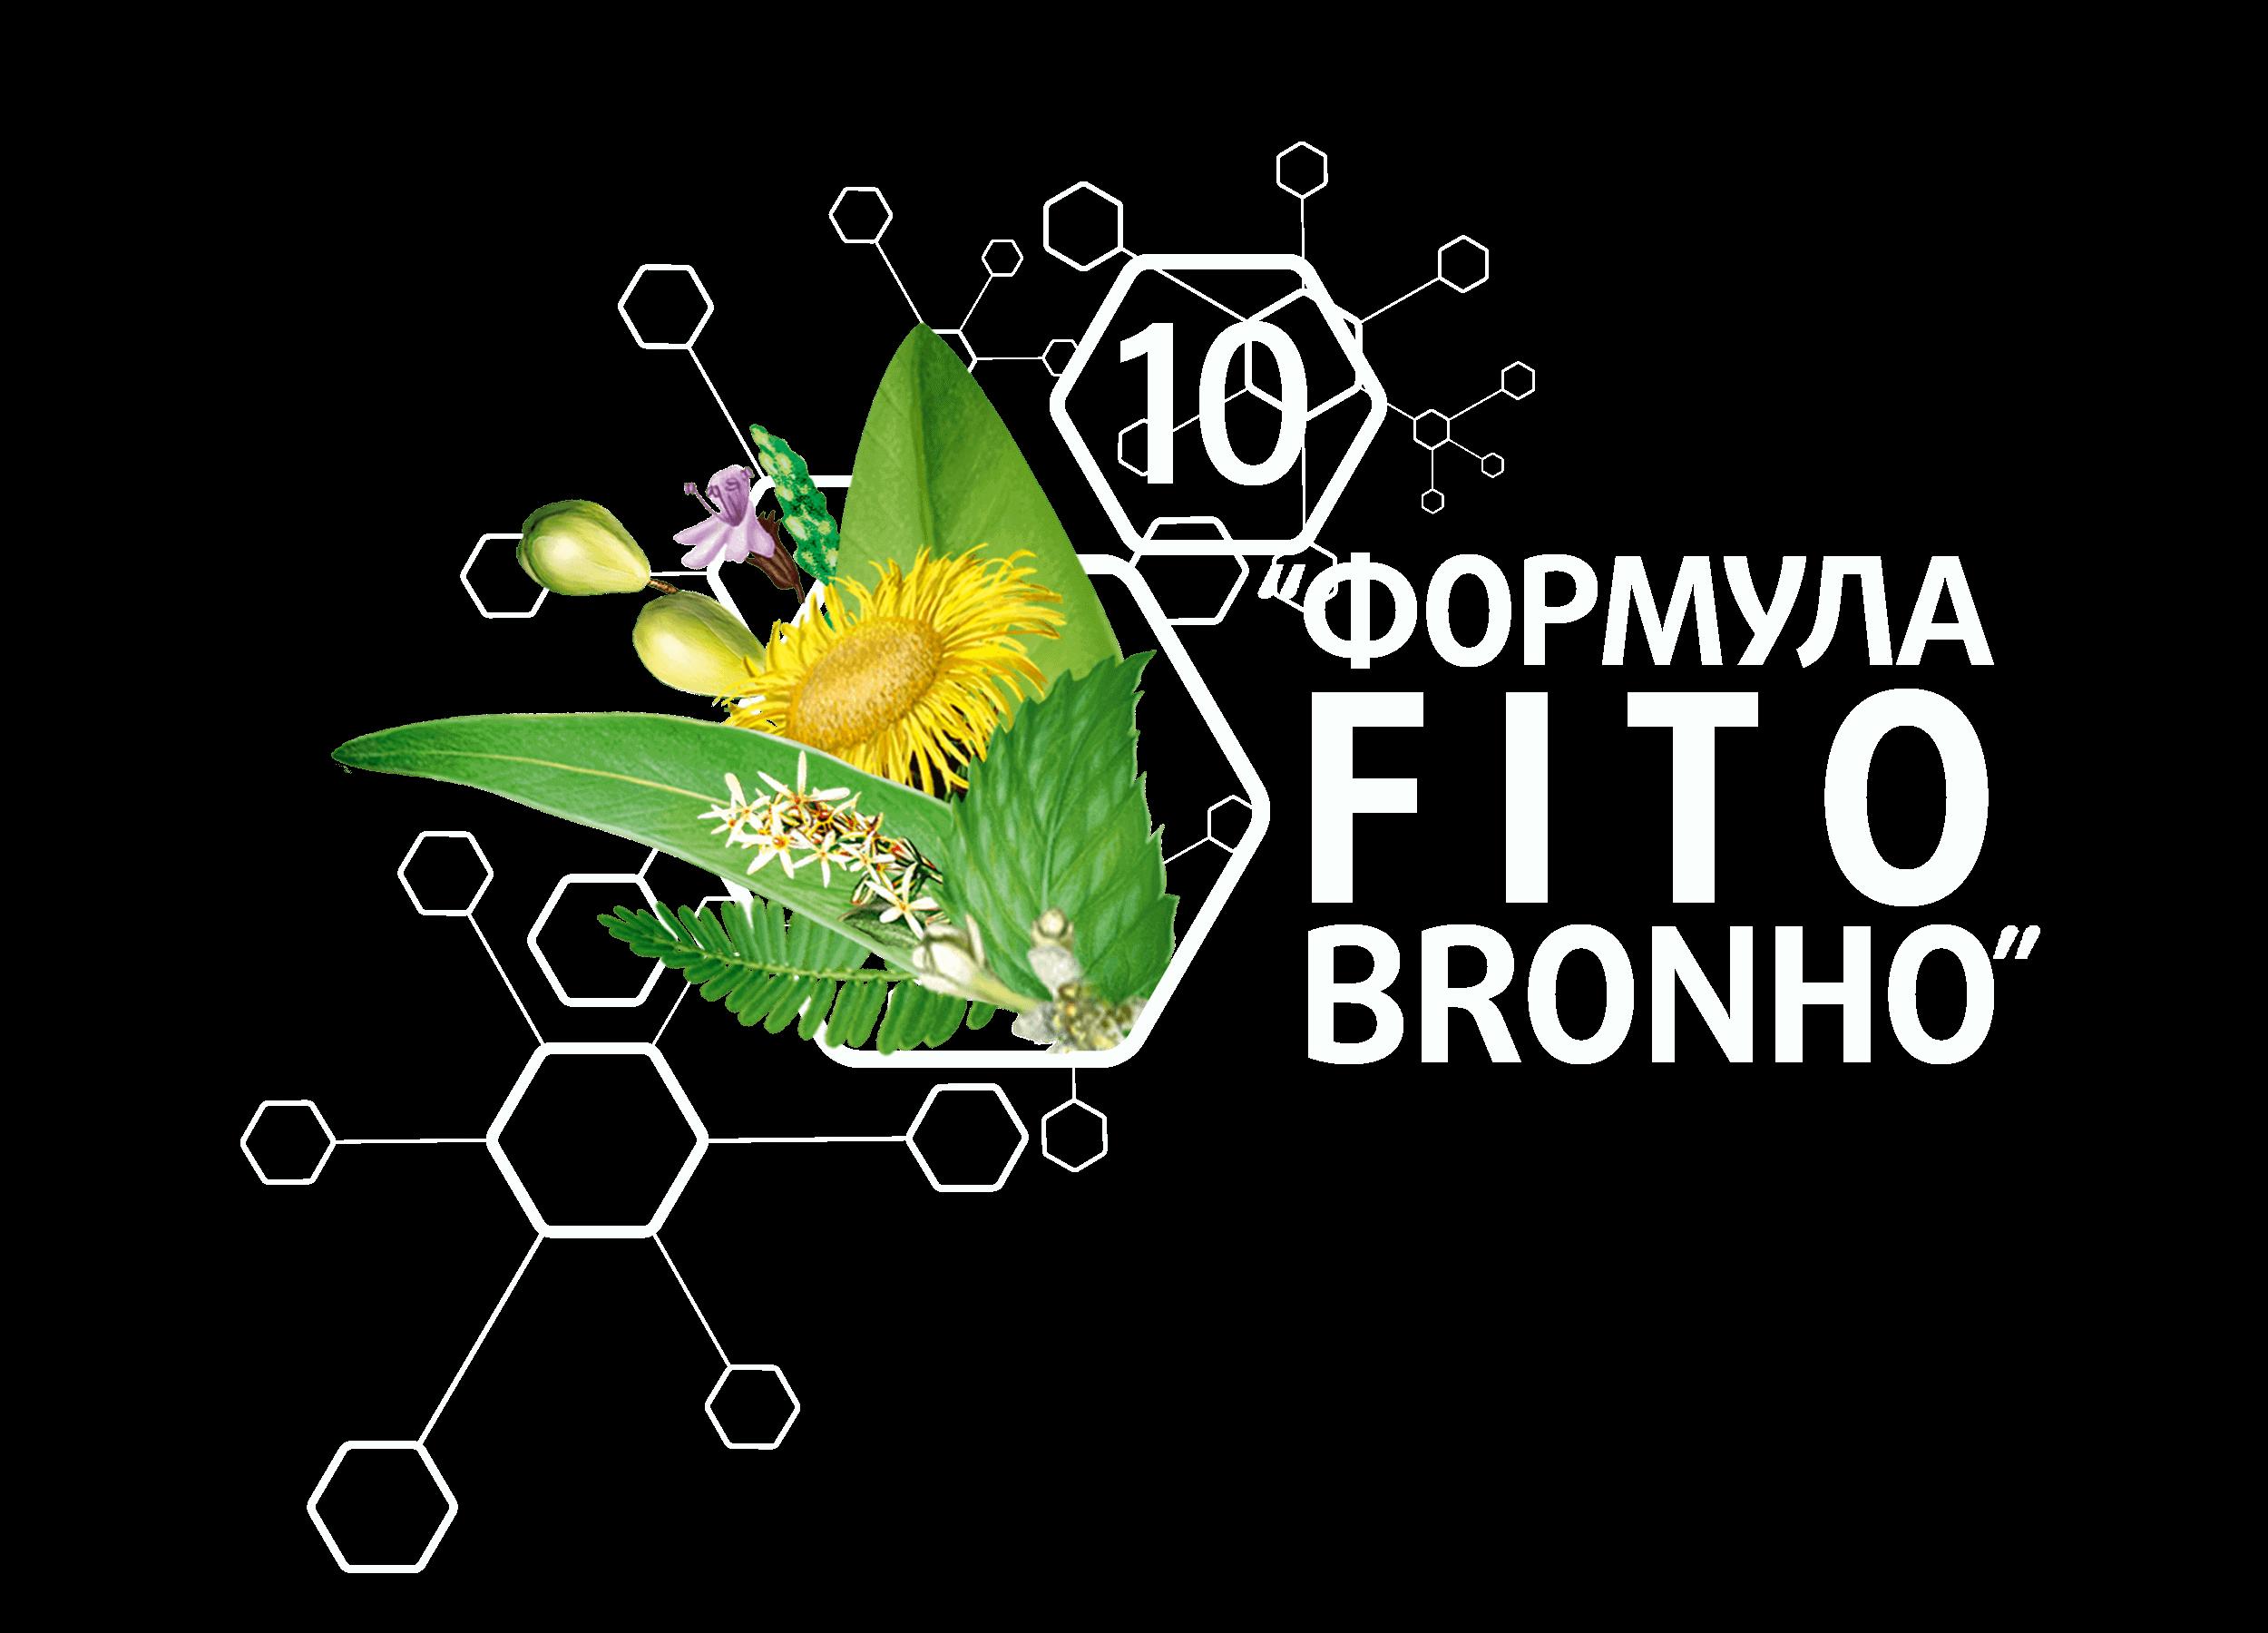 Формула FITO BRONHO в составе сиропа Доктор МОМ